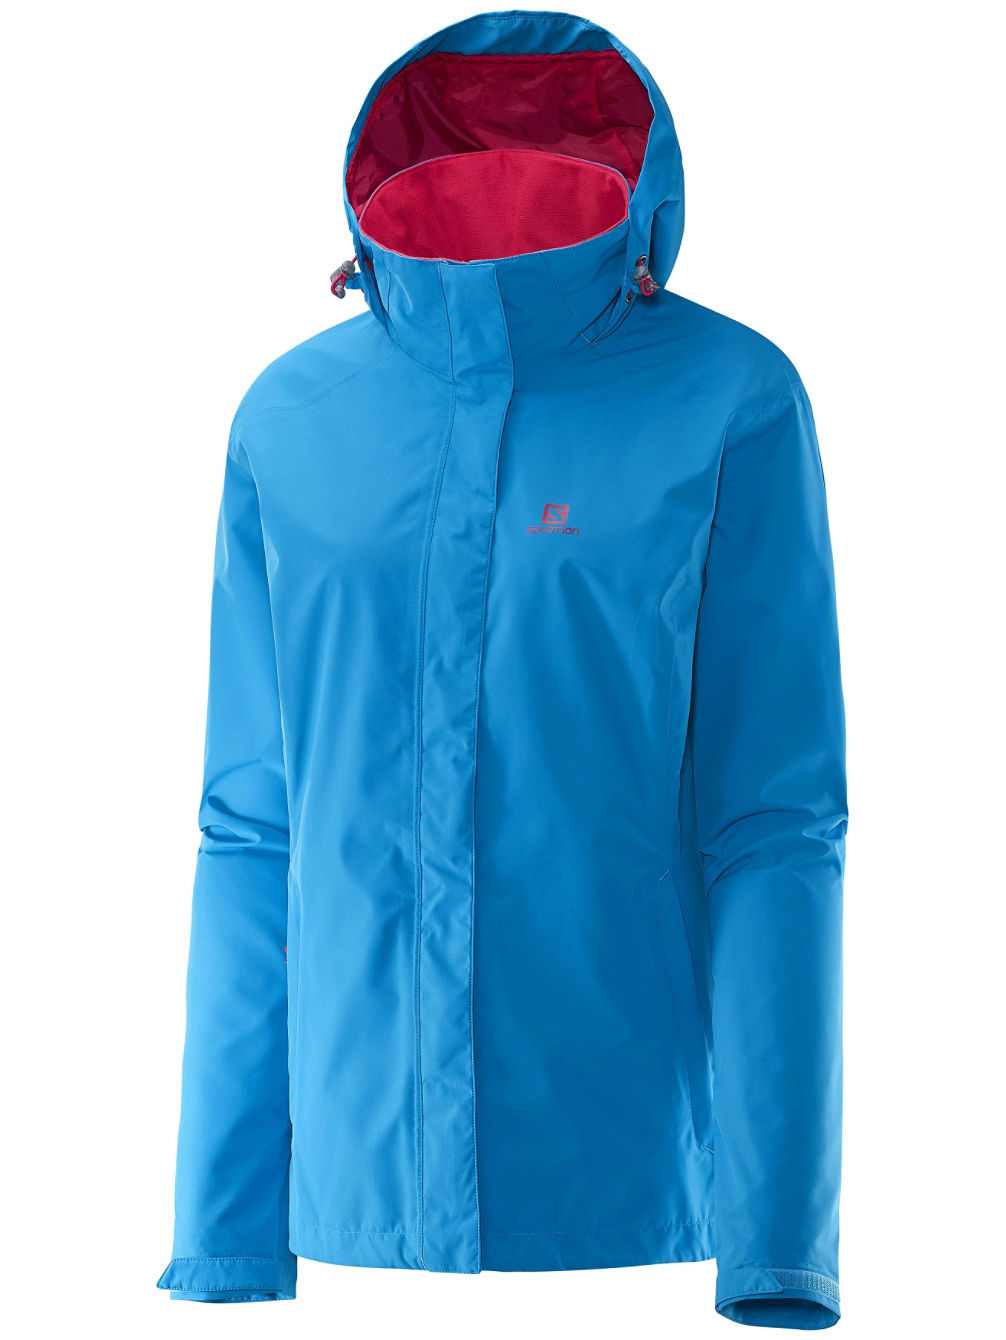 elemental-ad-outdoor-jacket